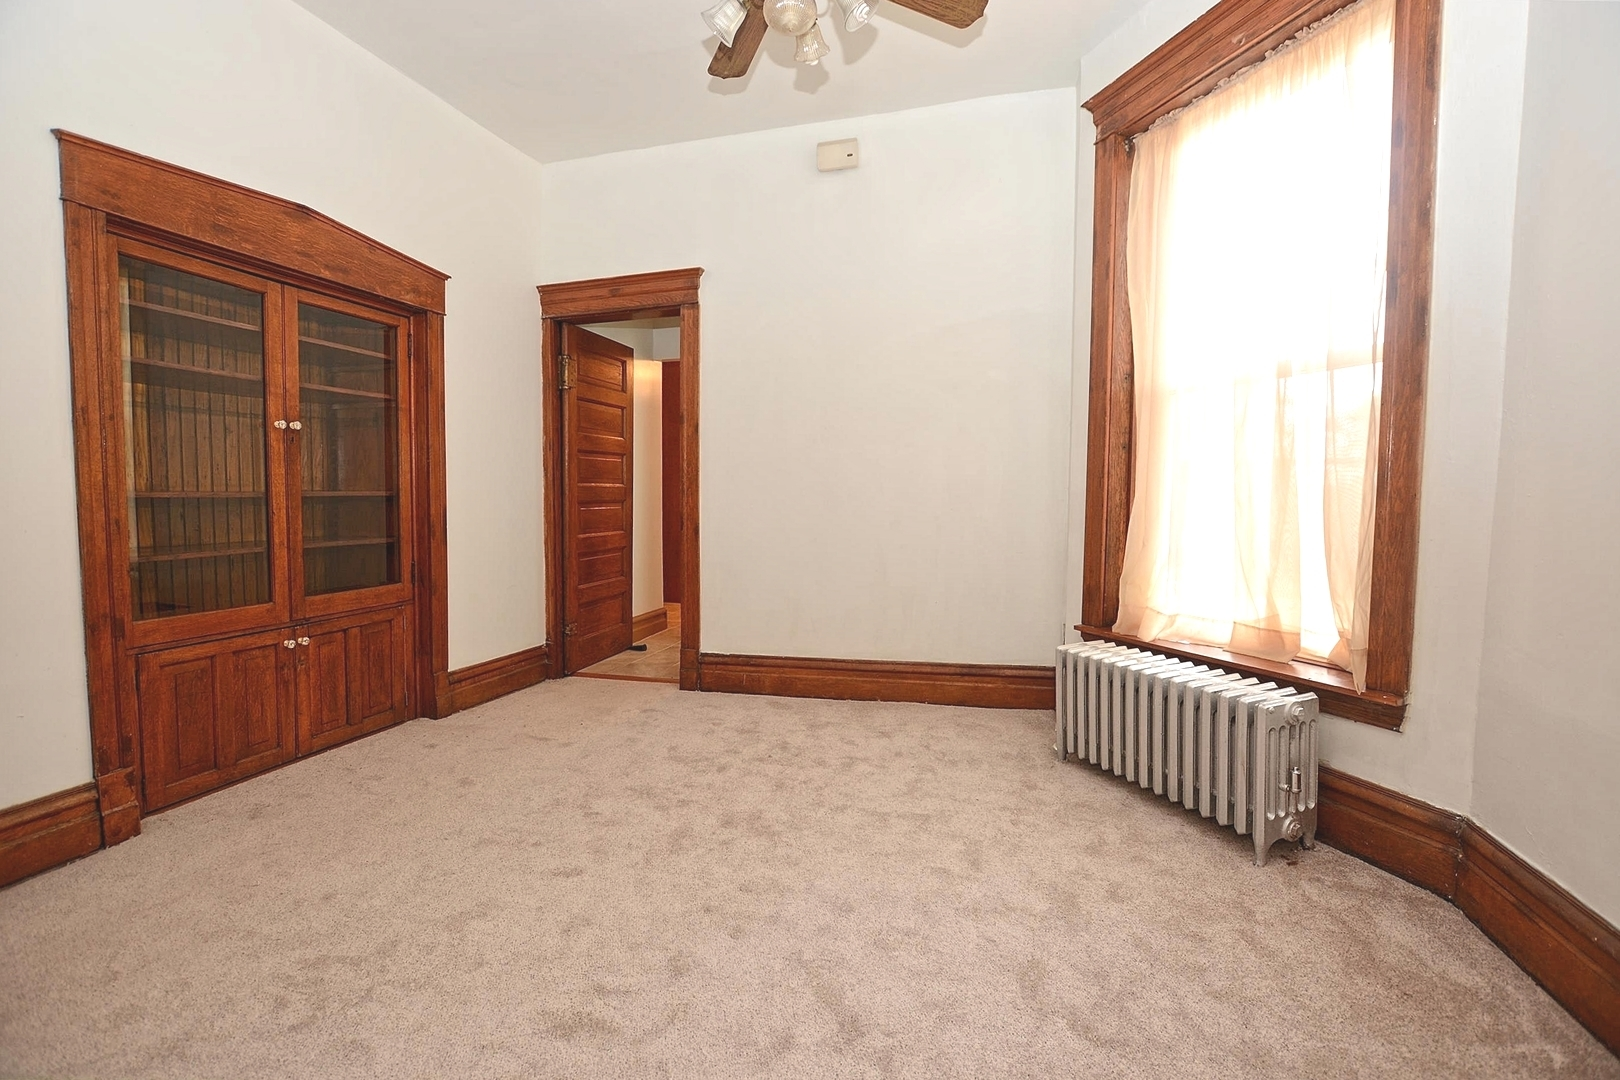 3610 South Calumet, CHICAGO, Illinois, 60653